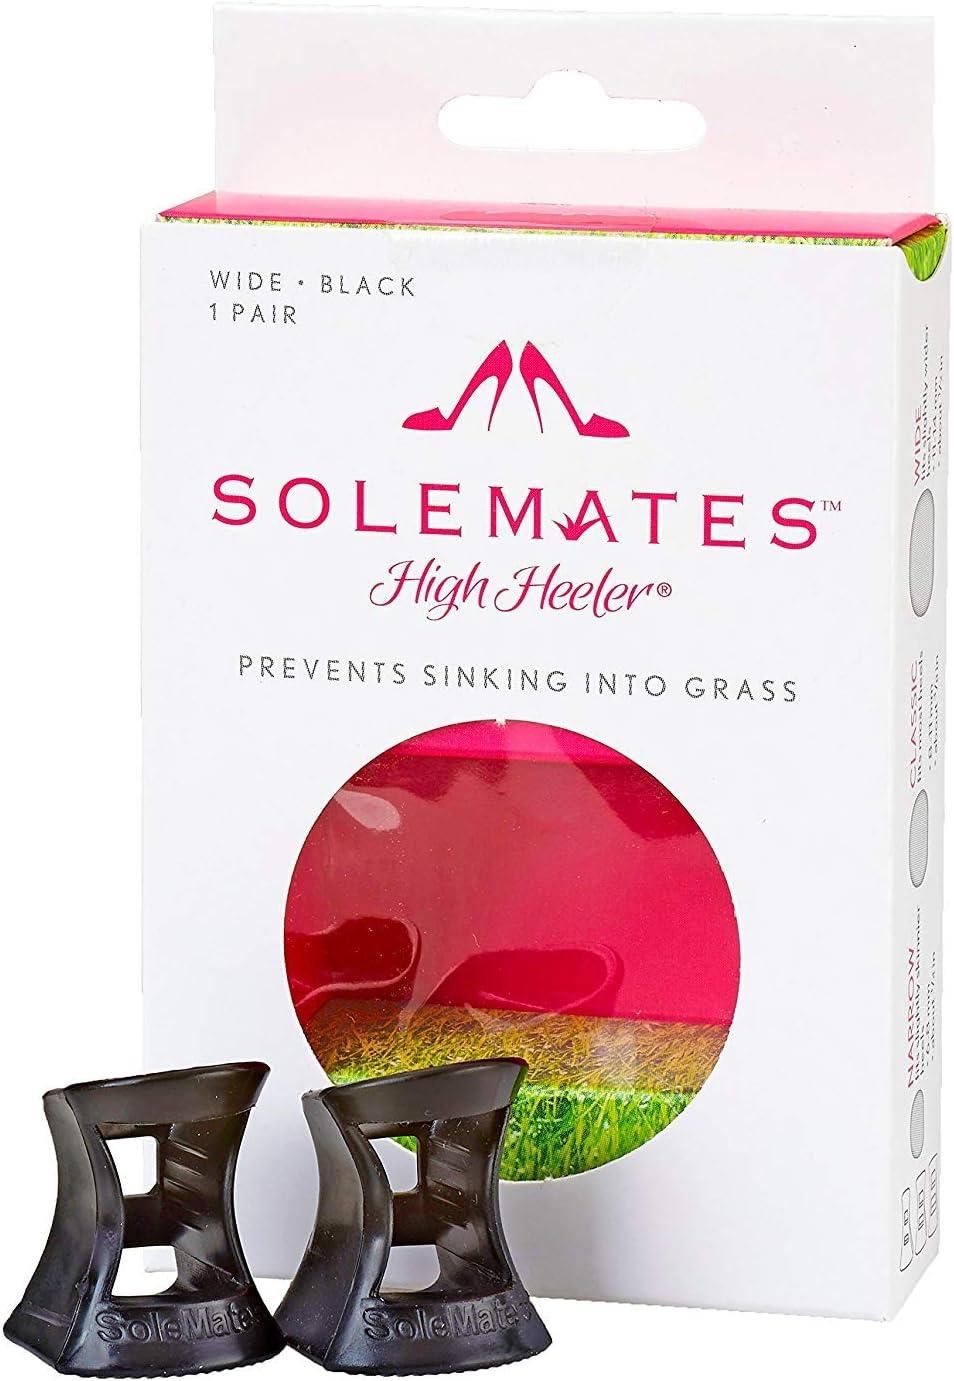 Solemates High Heel Protectors (Black, Wide)